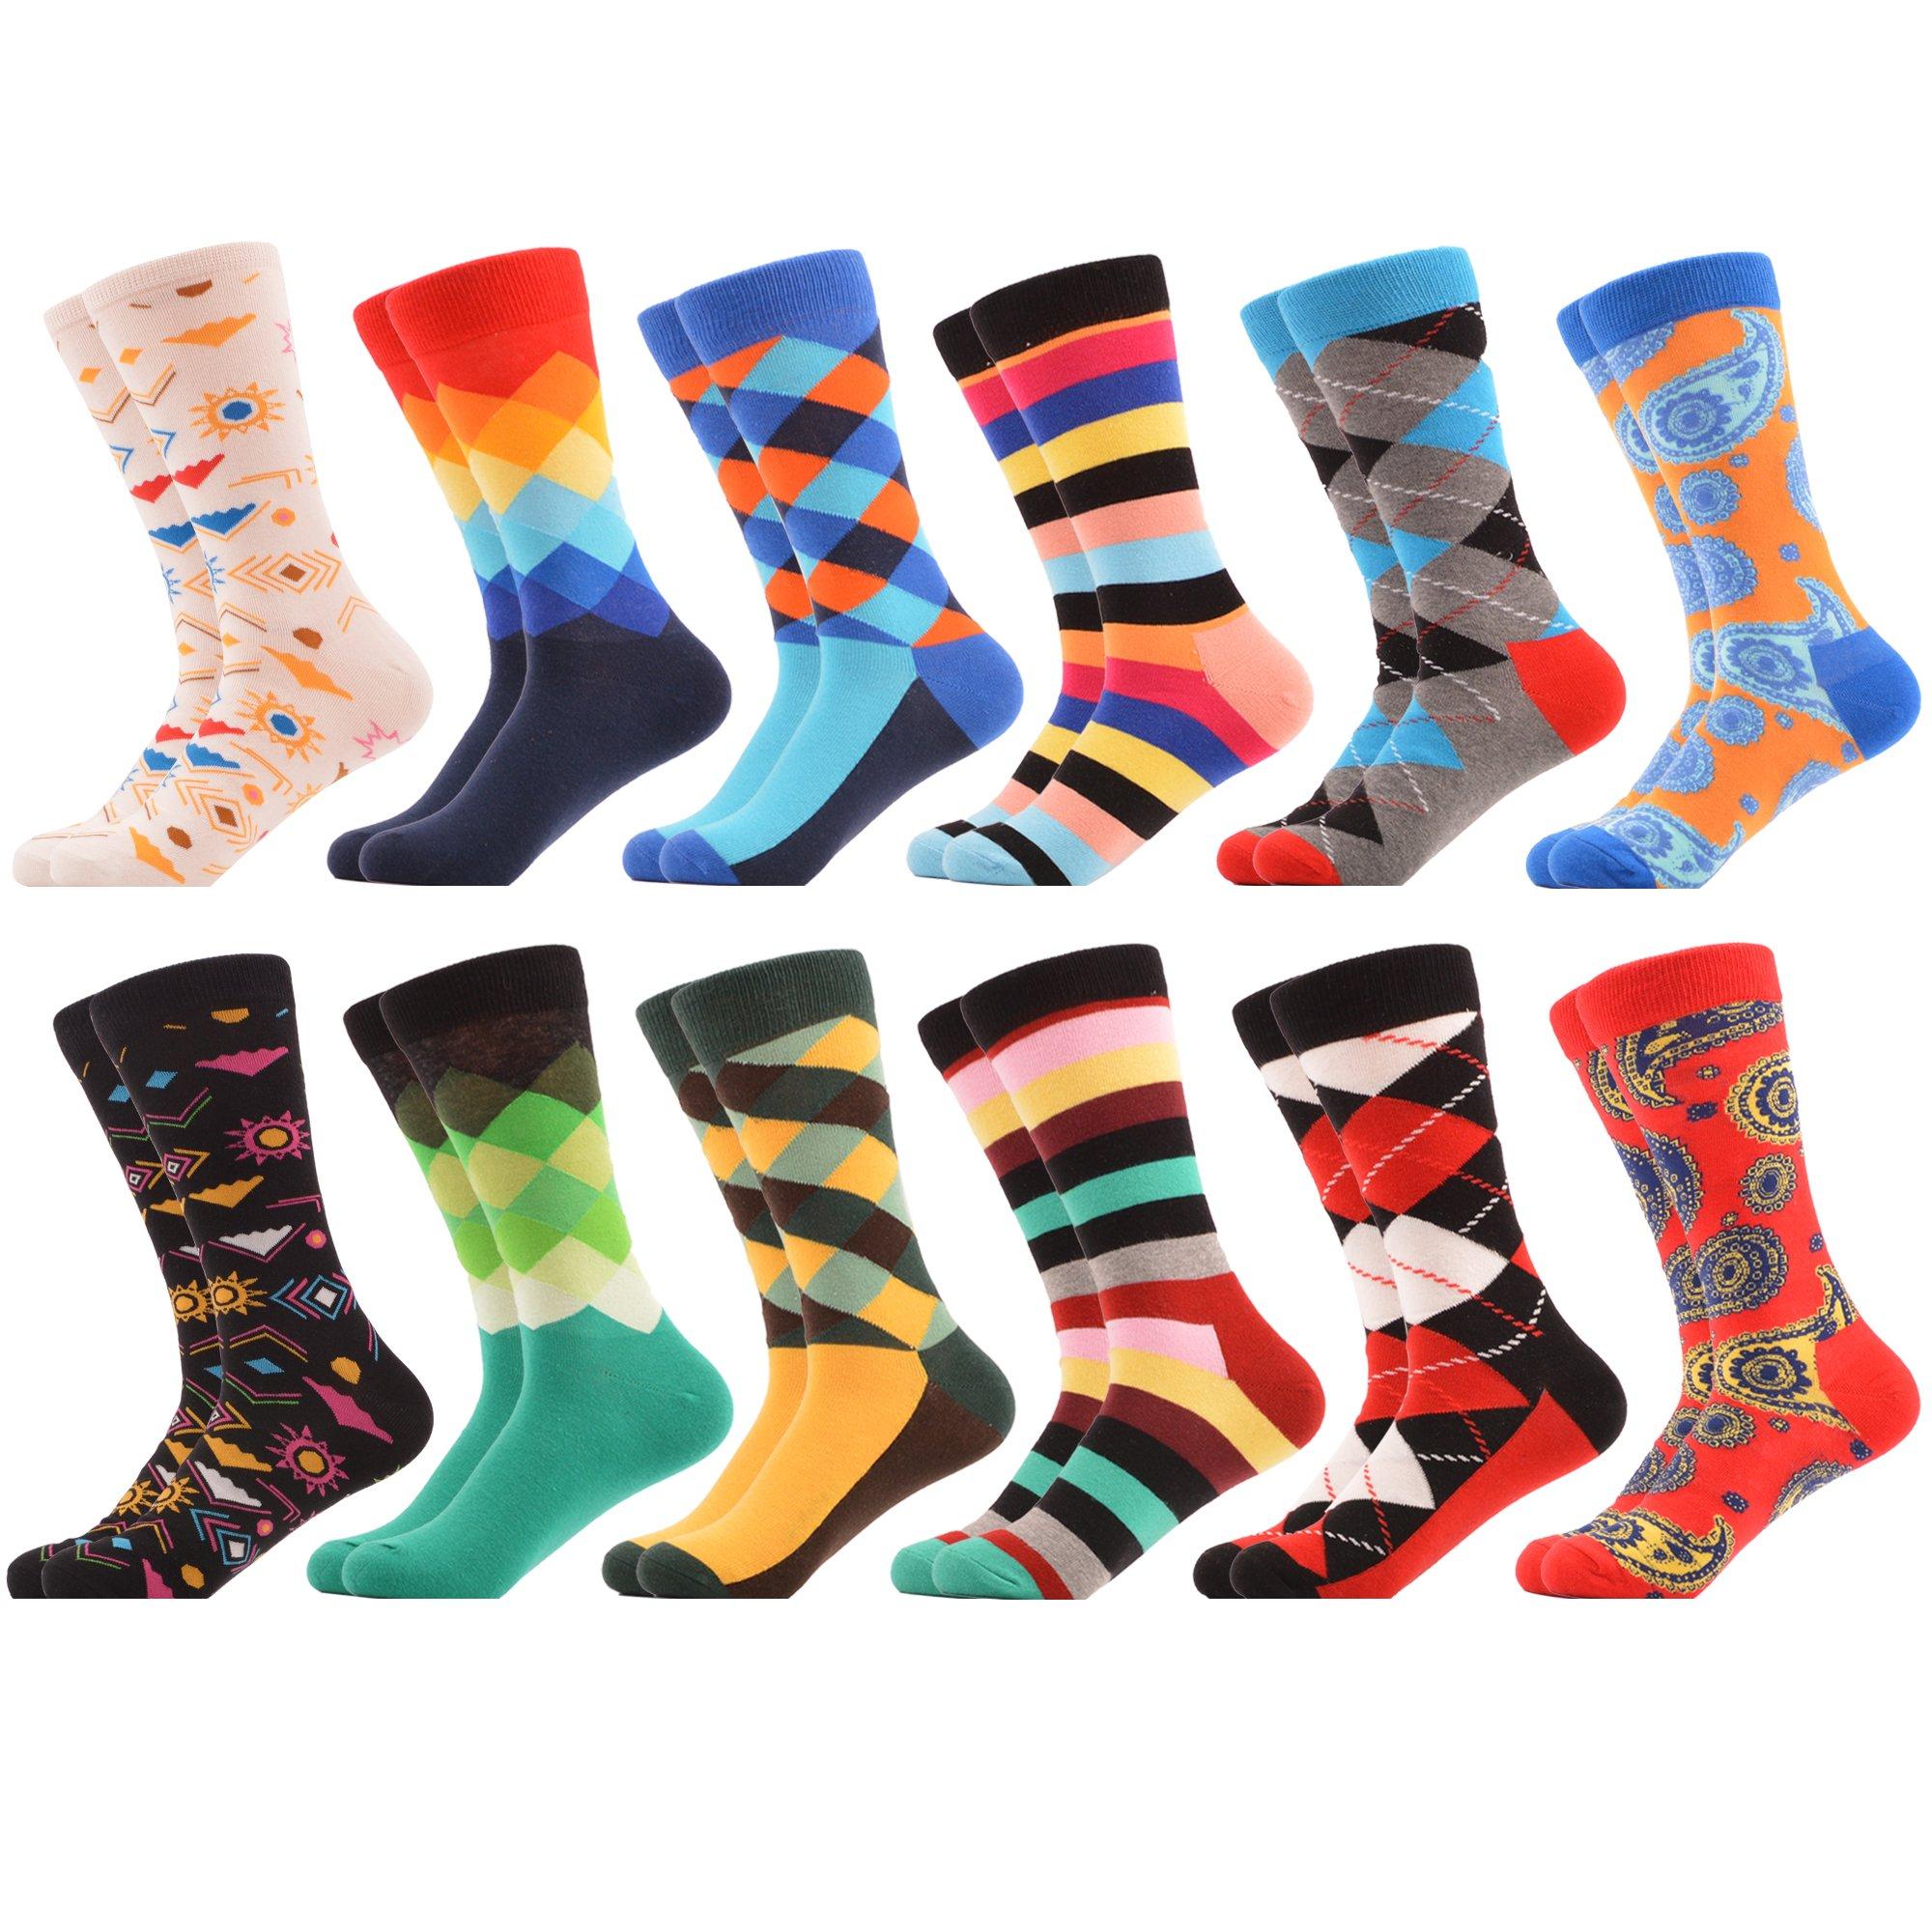 WeciBor Men's Classic Argyle Funny Dress Party Combed Cotton Socks 12 Packs Christmas Gift,052-75,Large, (Unisex US 7.5-12)